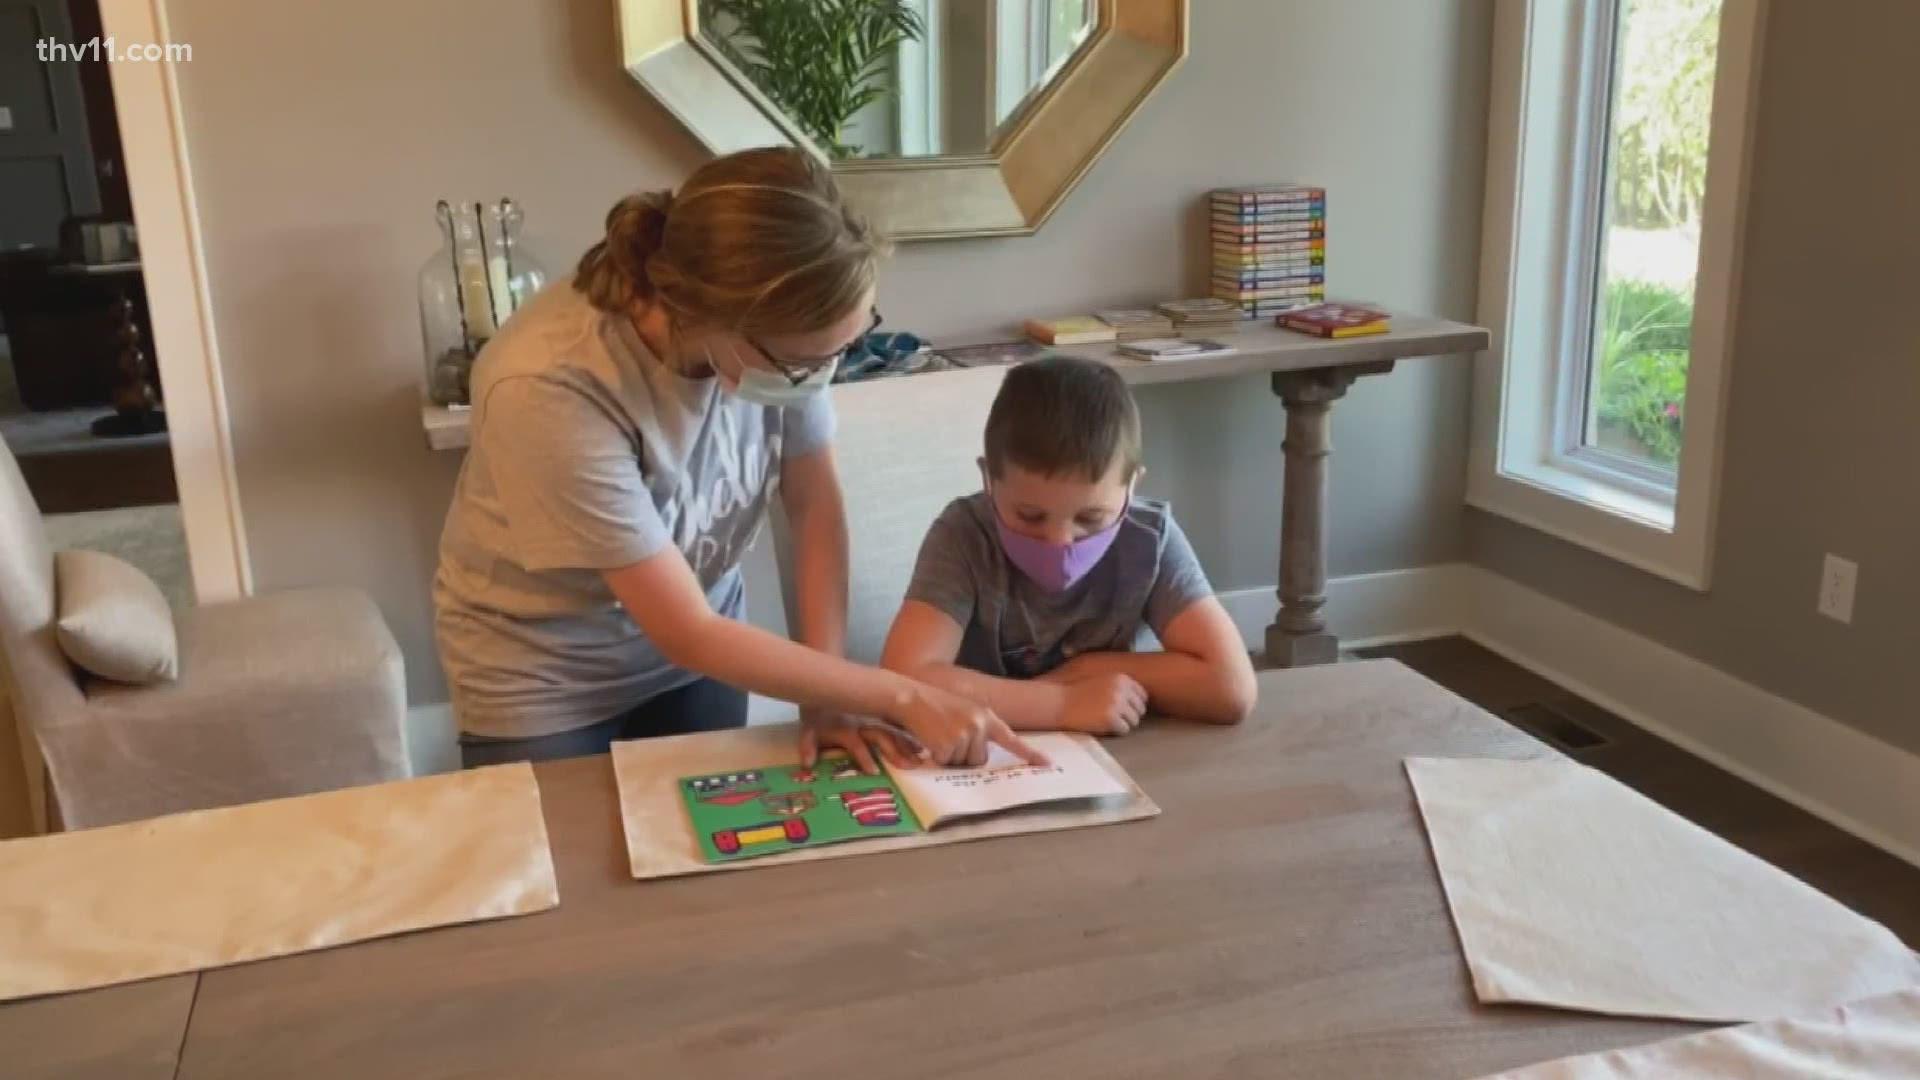 Cabot family starts school tutoring business amid COVID-19 | fox61.com